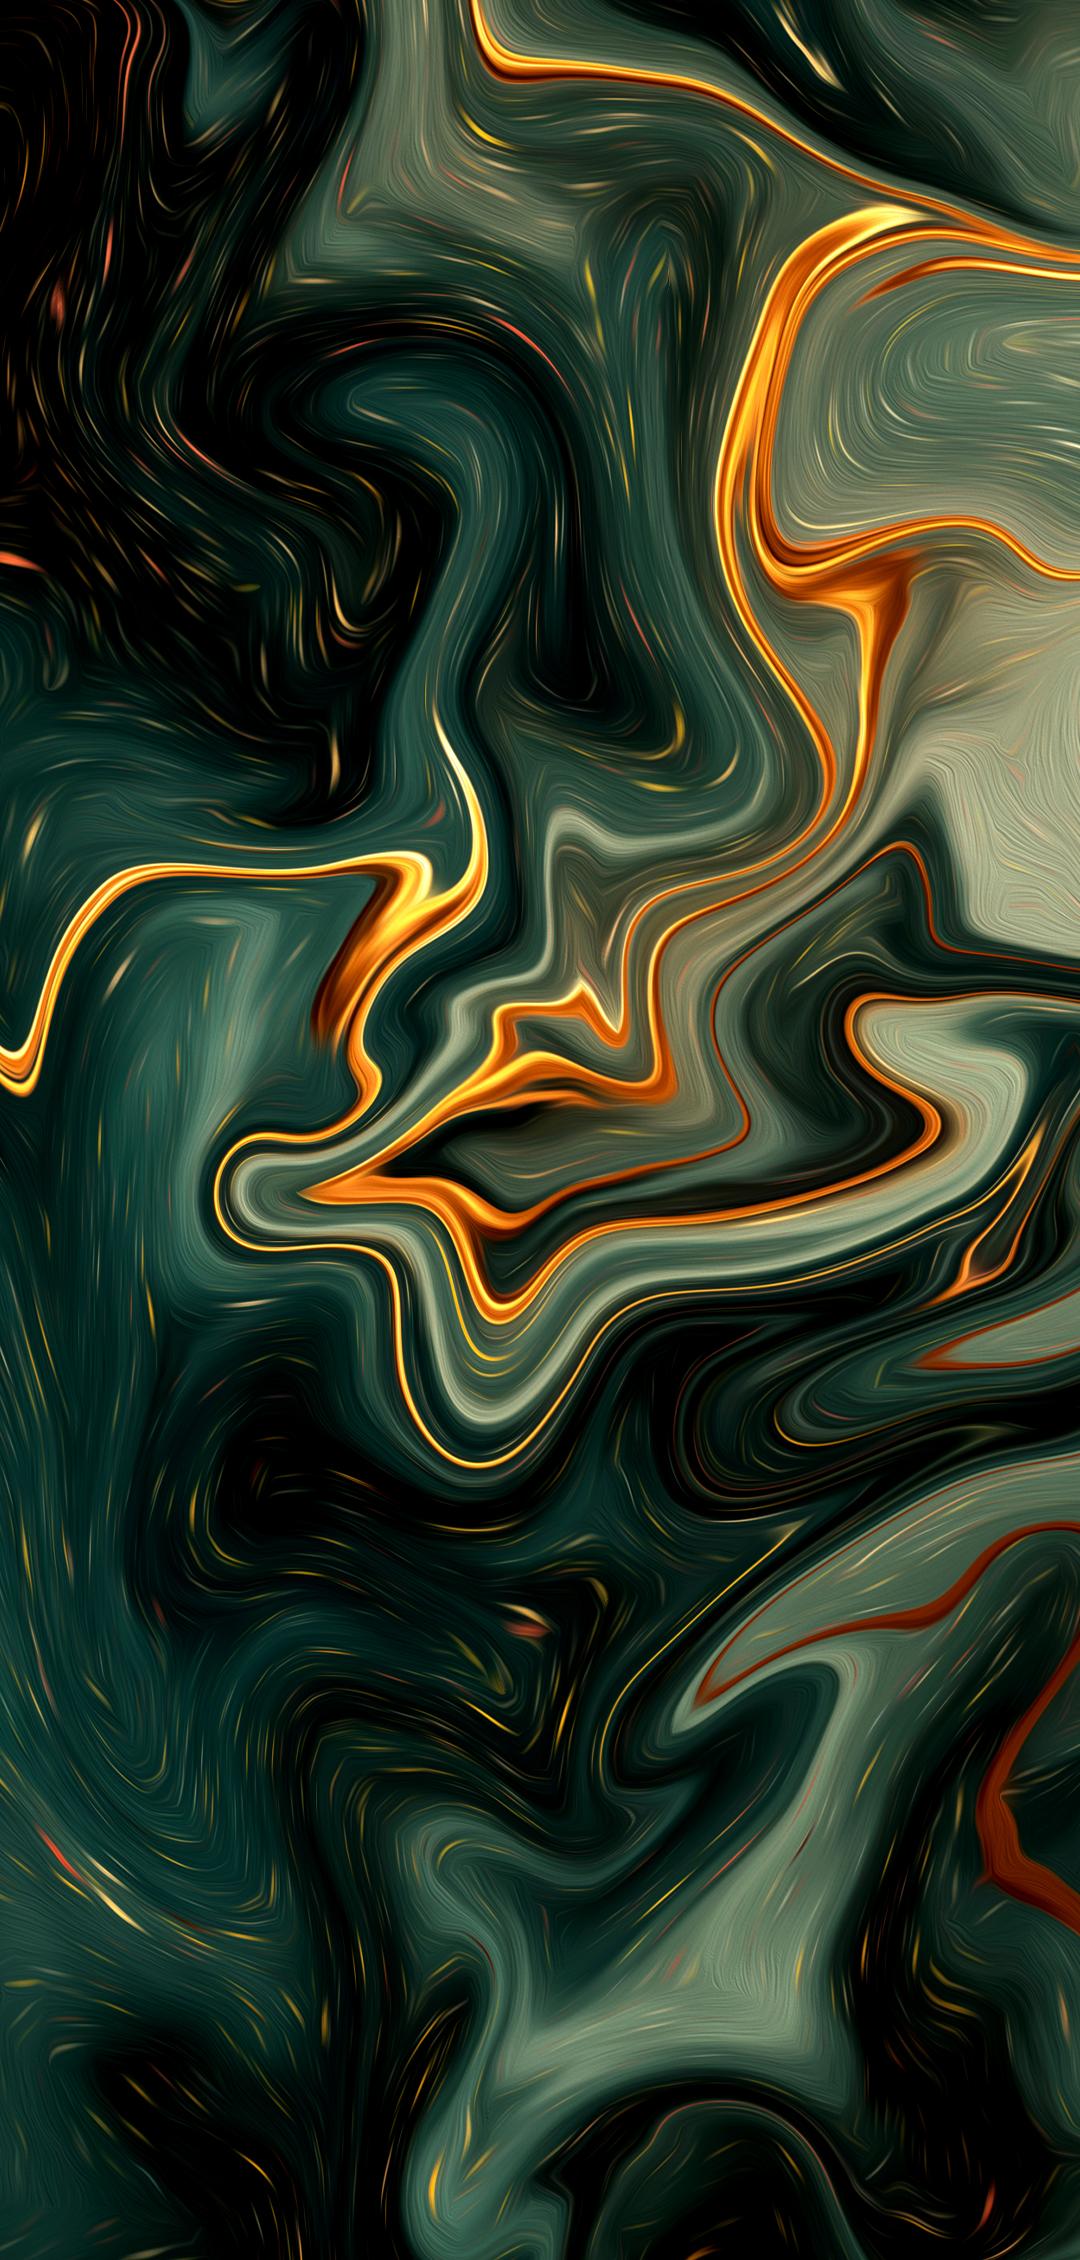 Samsung Galaxy Fold 2 Wallpaper Abstract Iphone Wallpaper Artistic Wallpaper Naruto Wallpaper Iphone